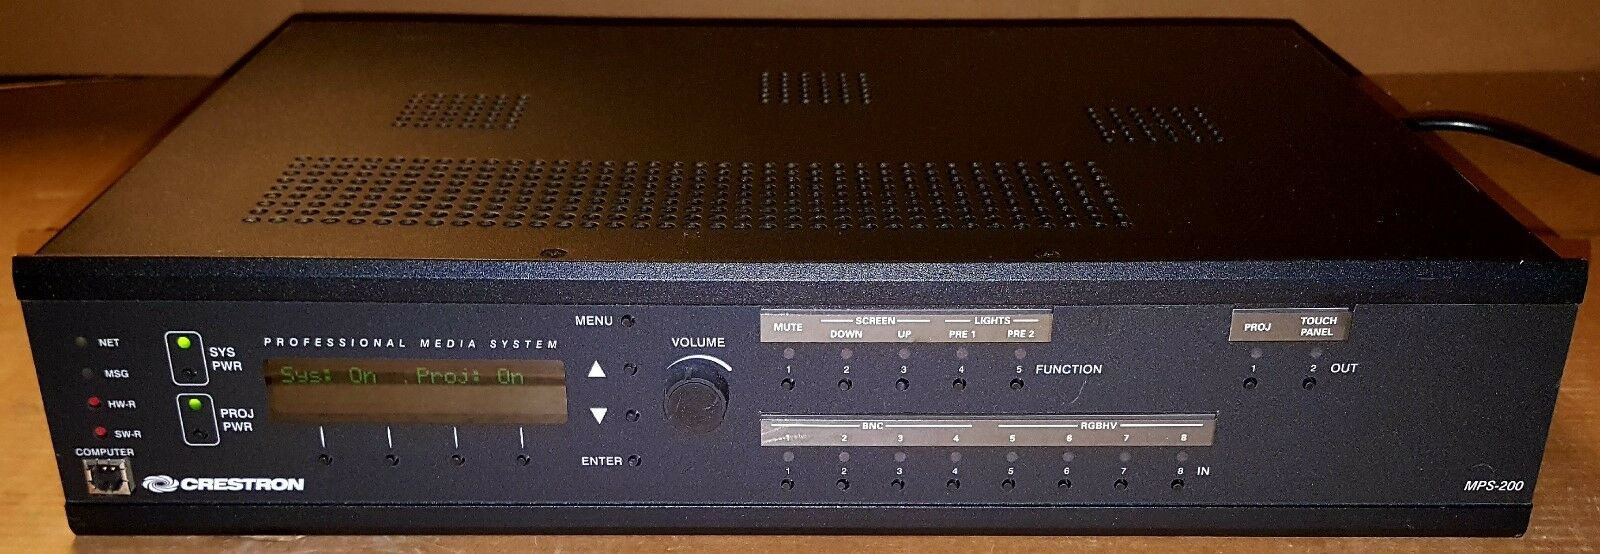 Crestron Multimedia Presentation System 200 MPS-200